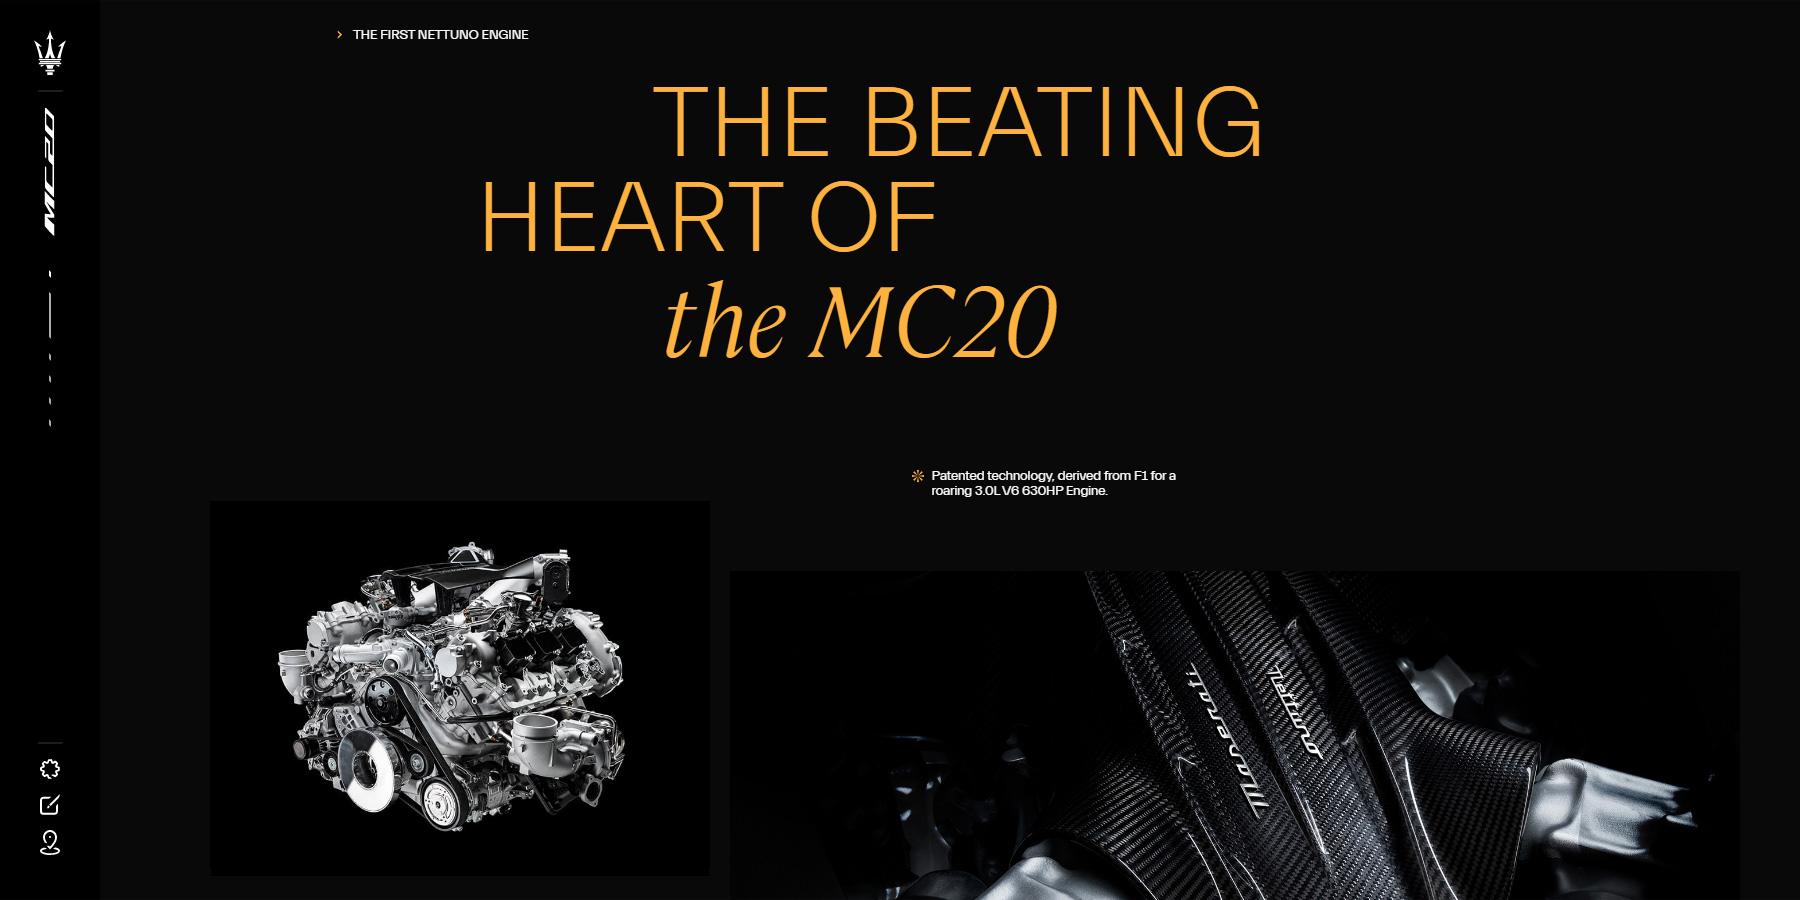 Maserati MC20 - Website of the Day